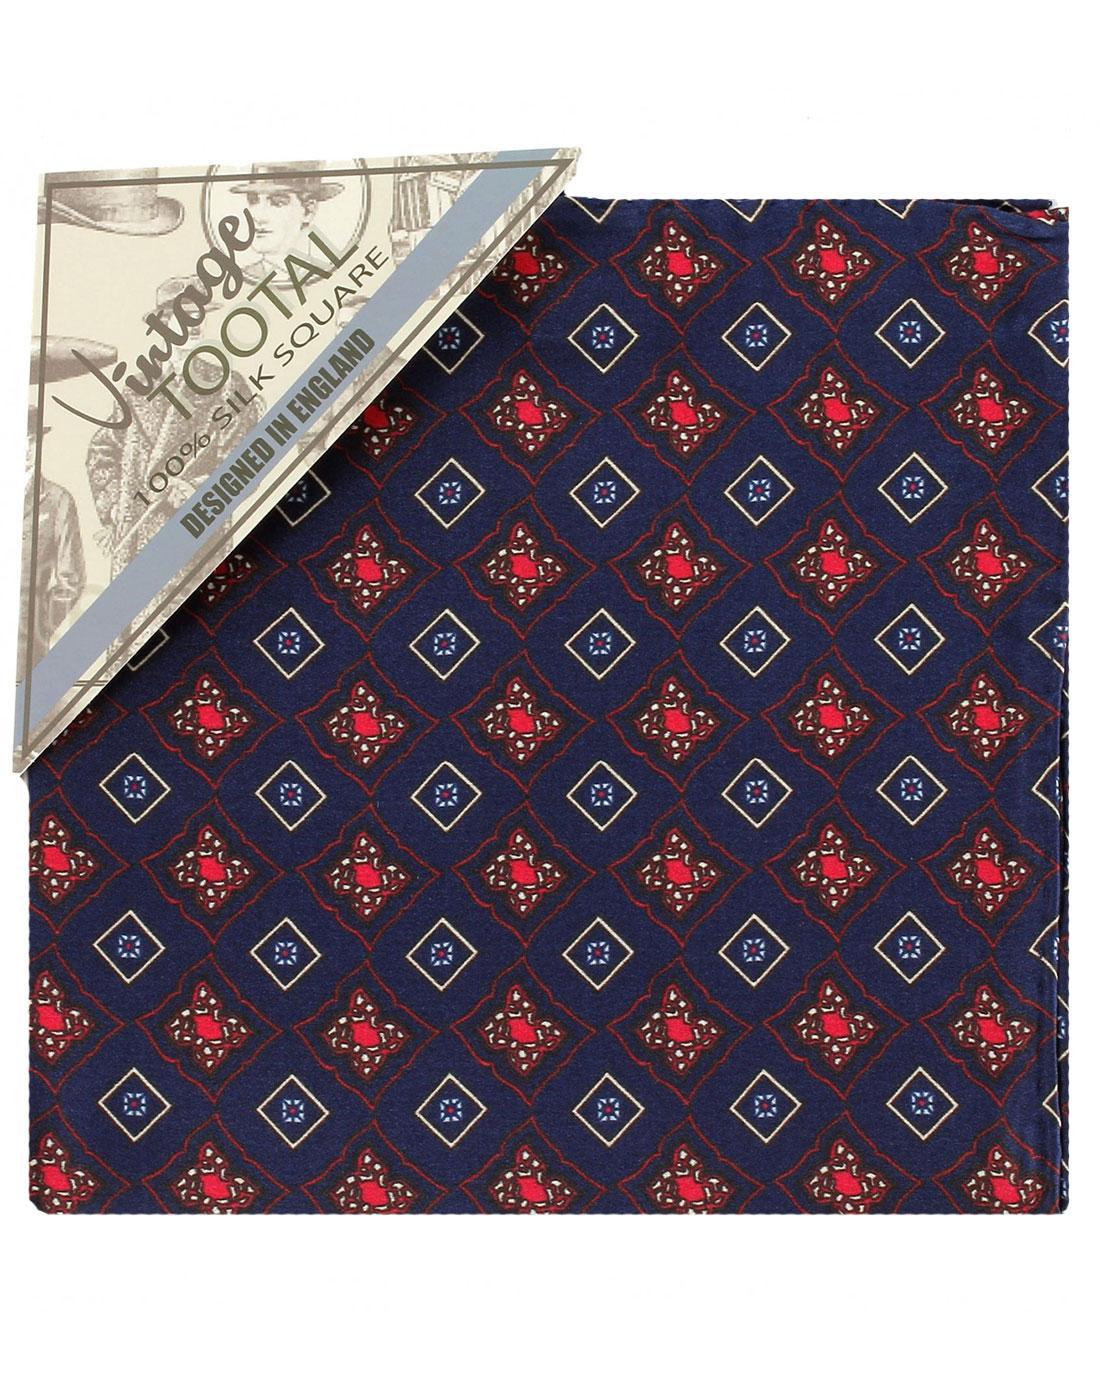 TOOTAL 60s Retro Mod Tile Silk Pocket Square Navy